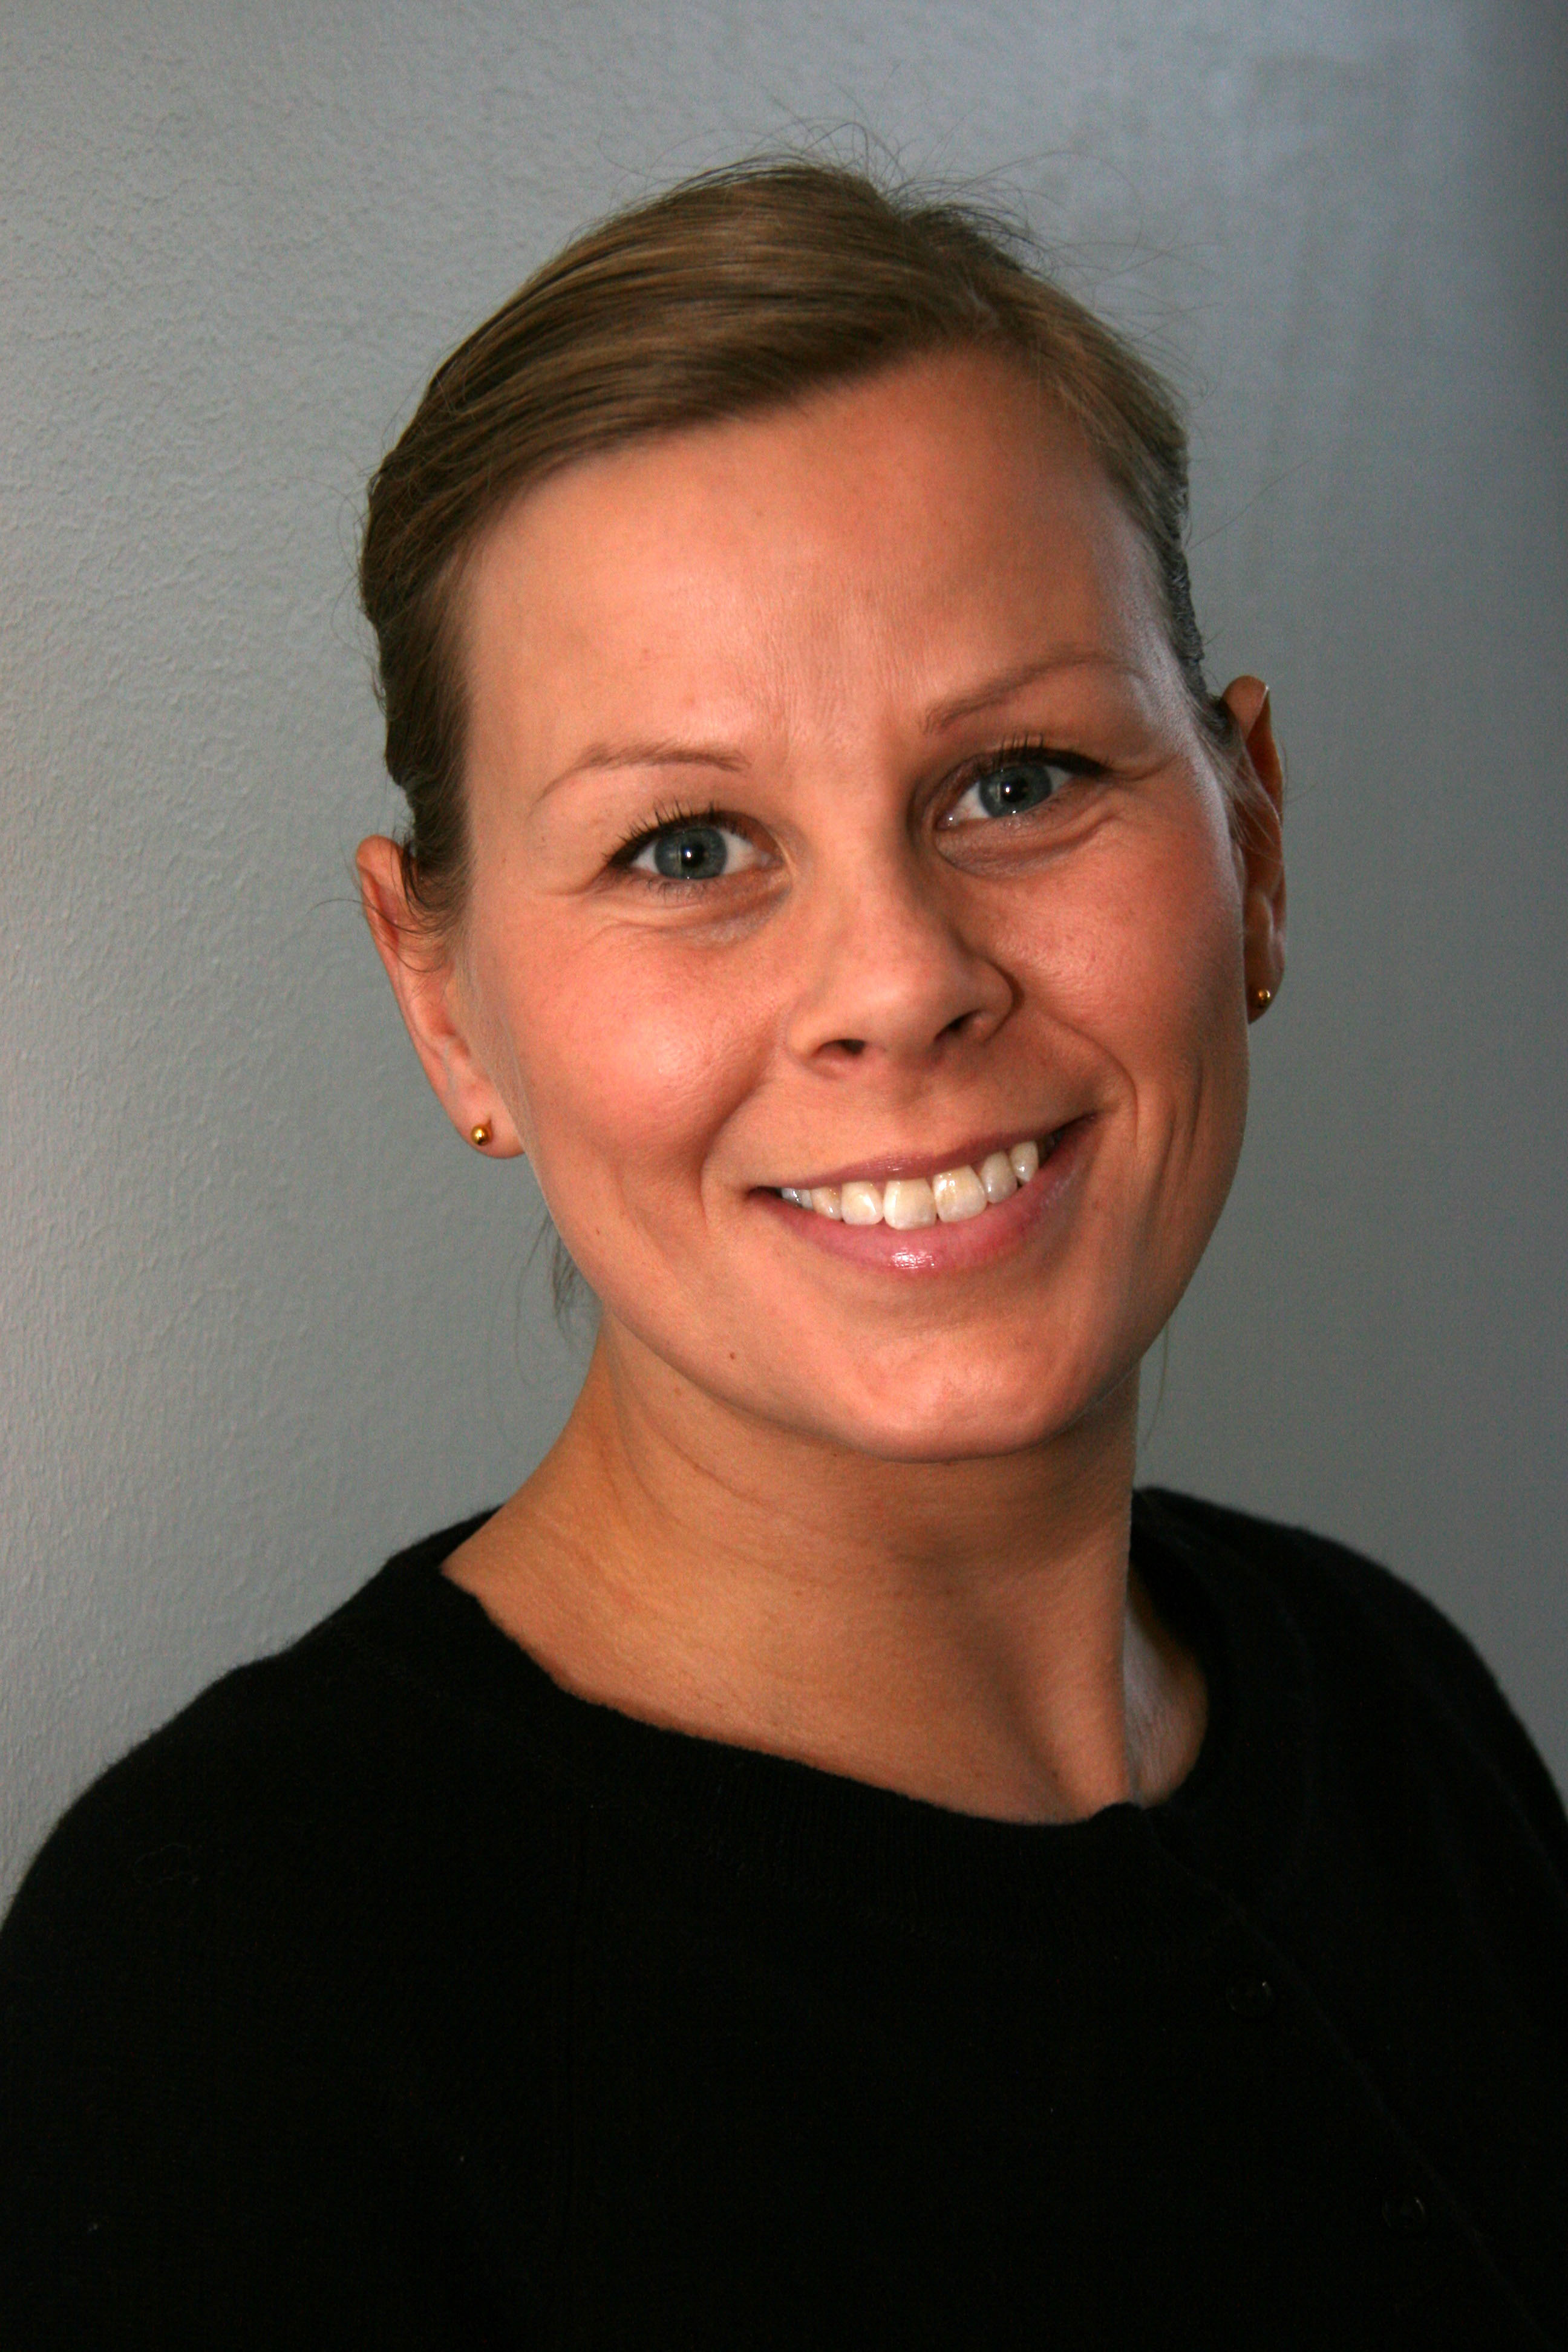 Sofie Venge Madsen